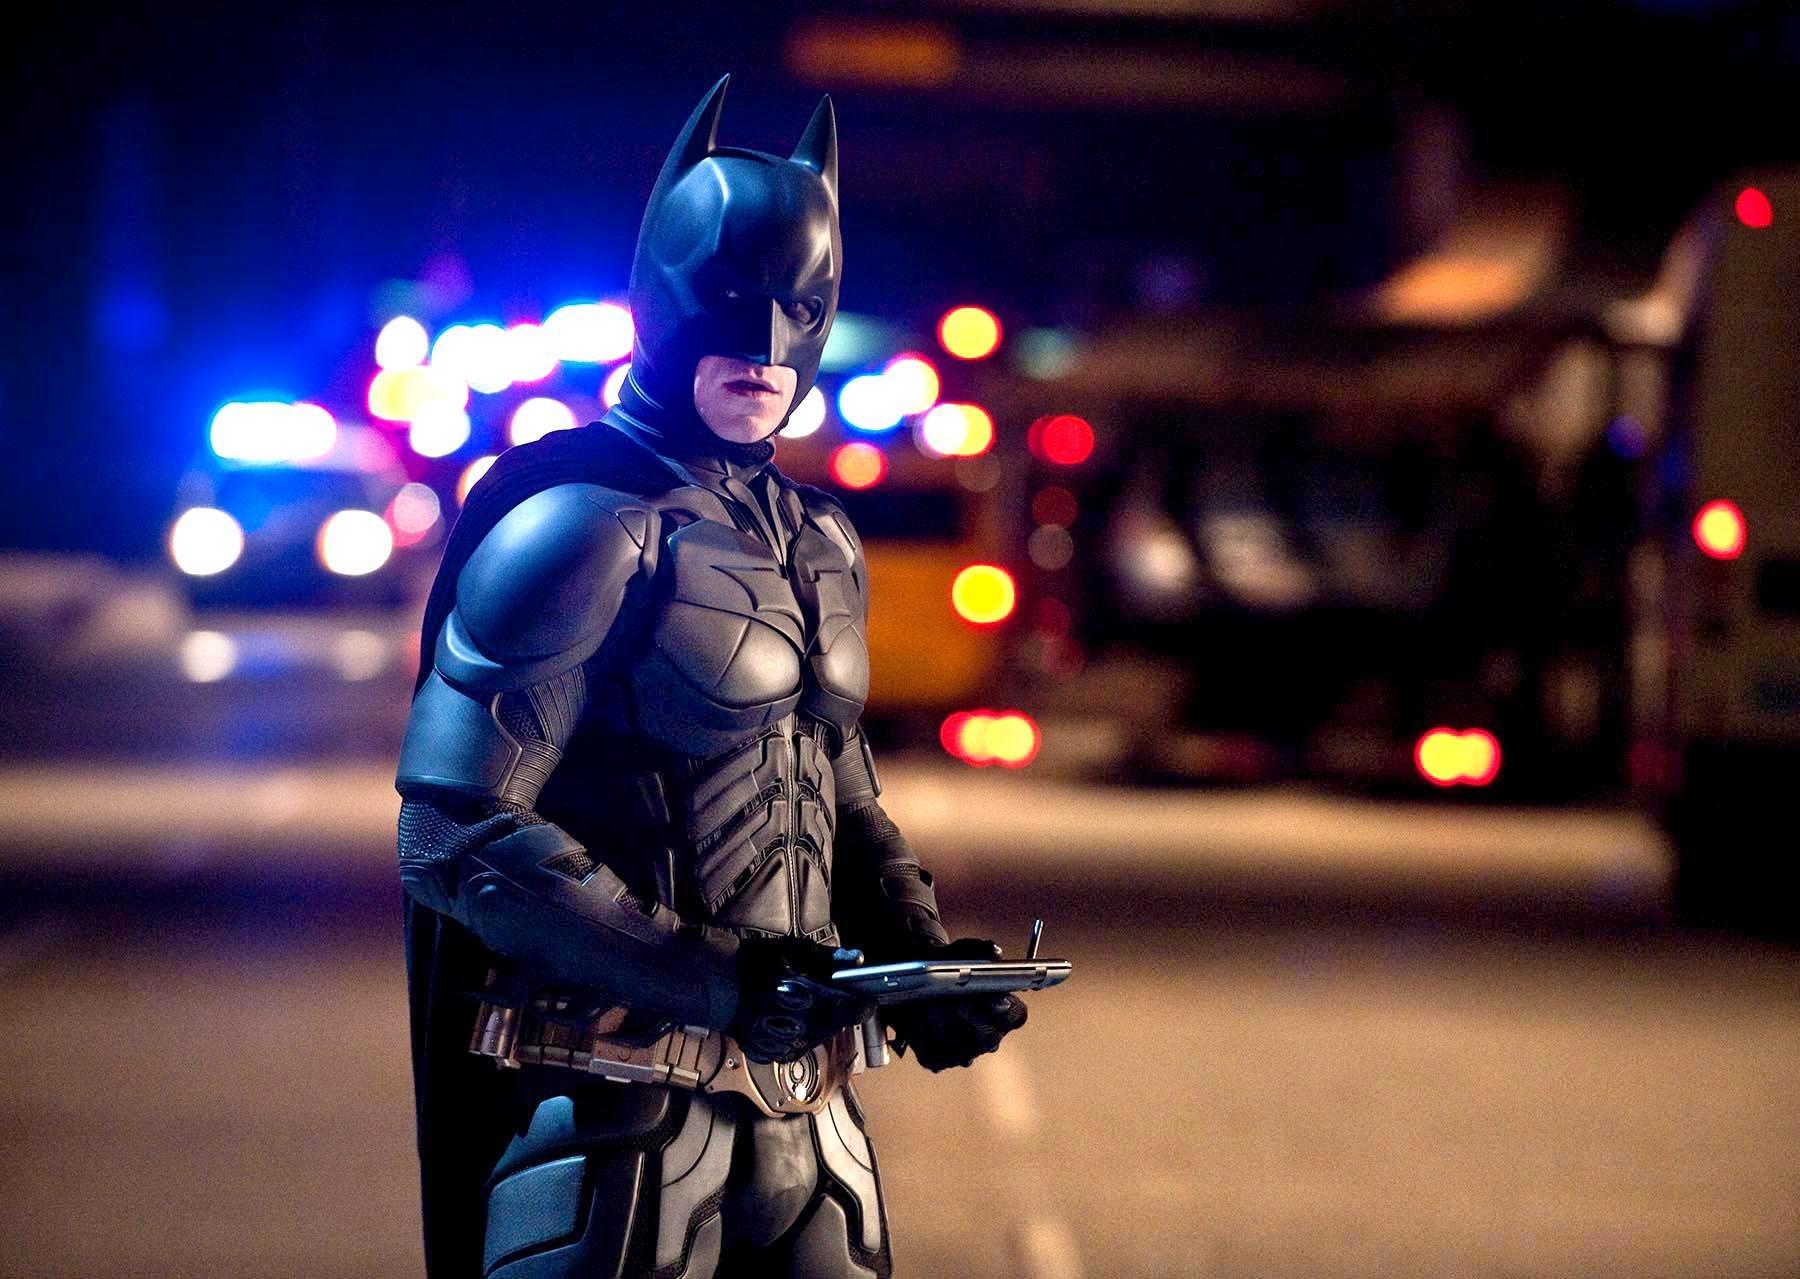 Oscar Prospects: The Dark Knight Rises